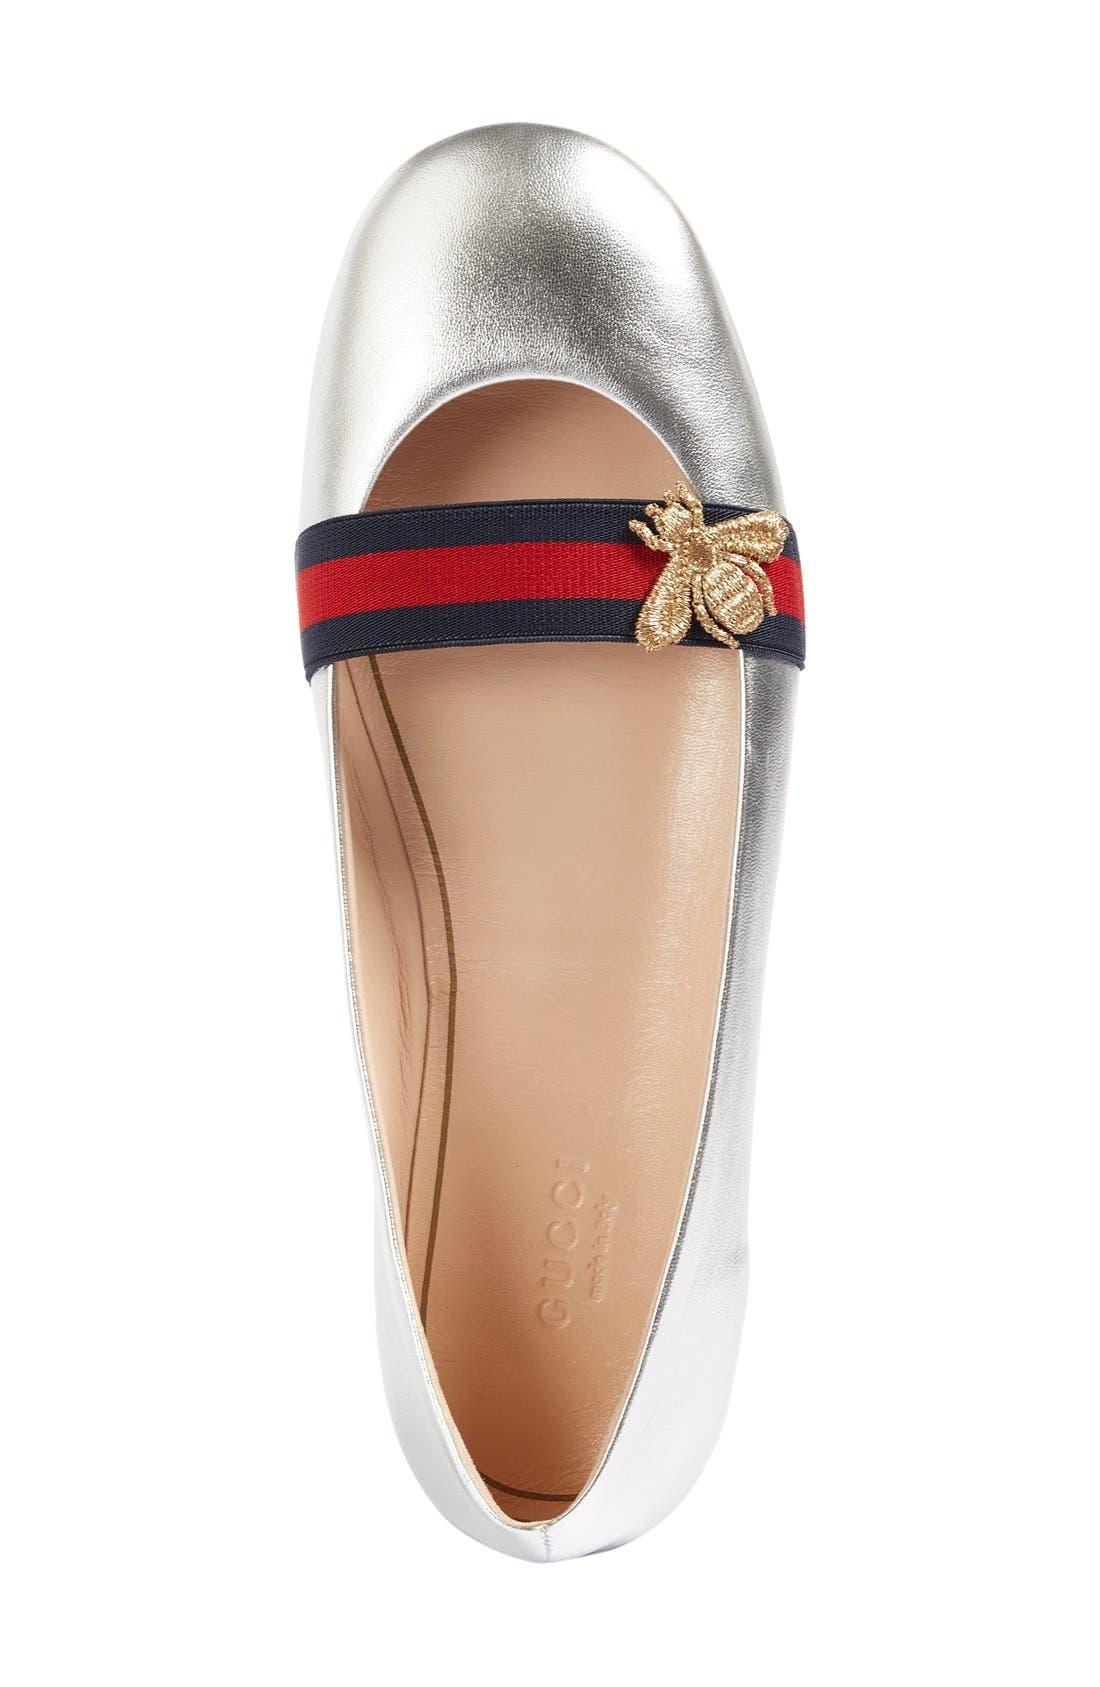 Alternate Image 3  - Gucci 'Bayadere' Ballerina Flat (Women)